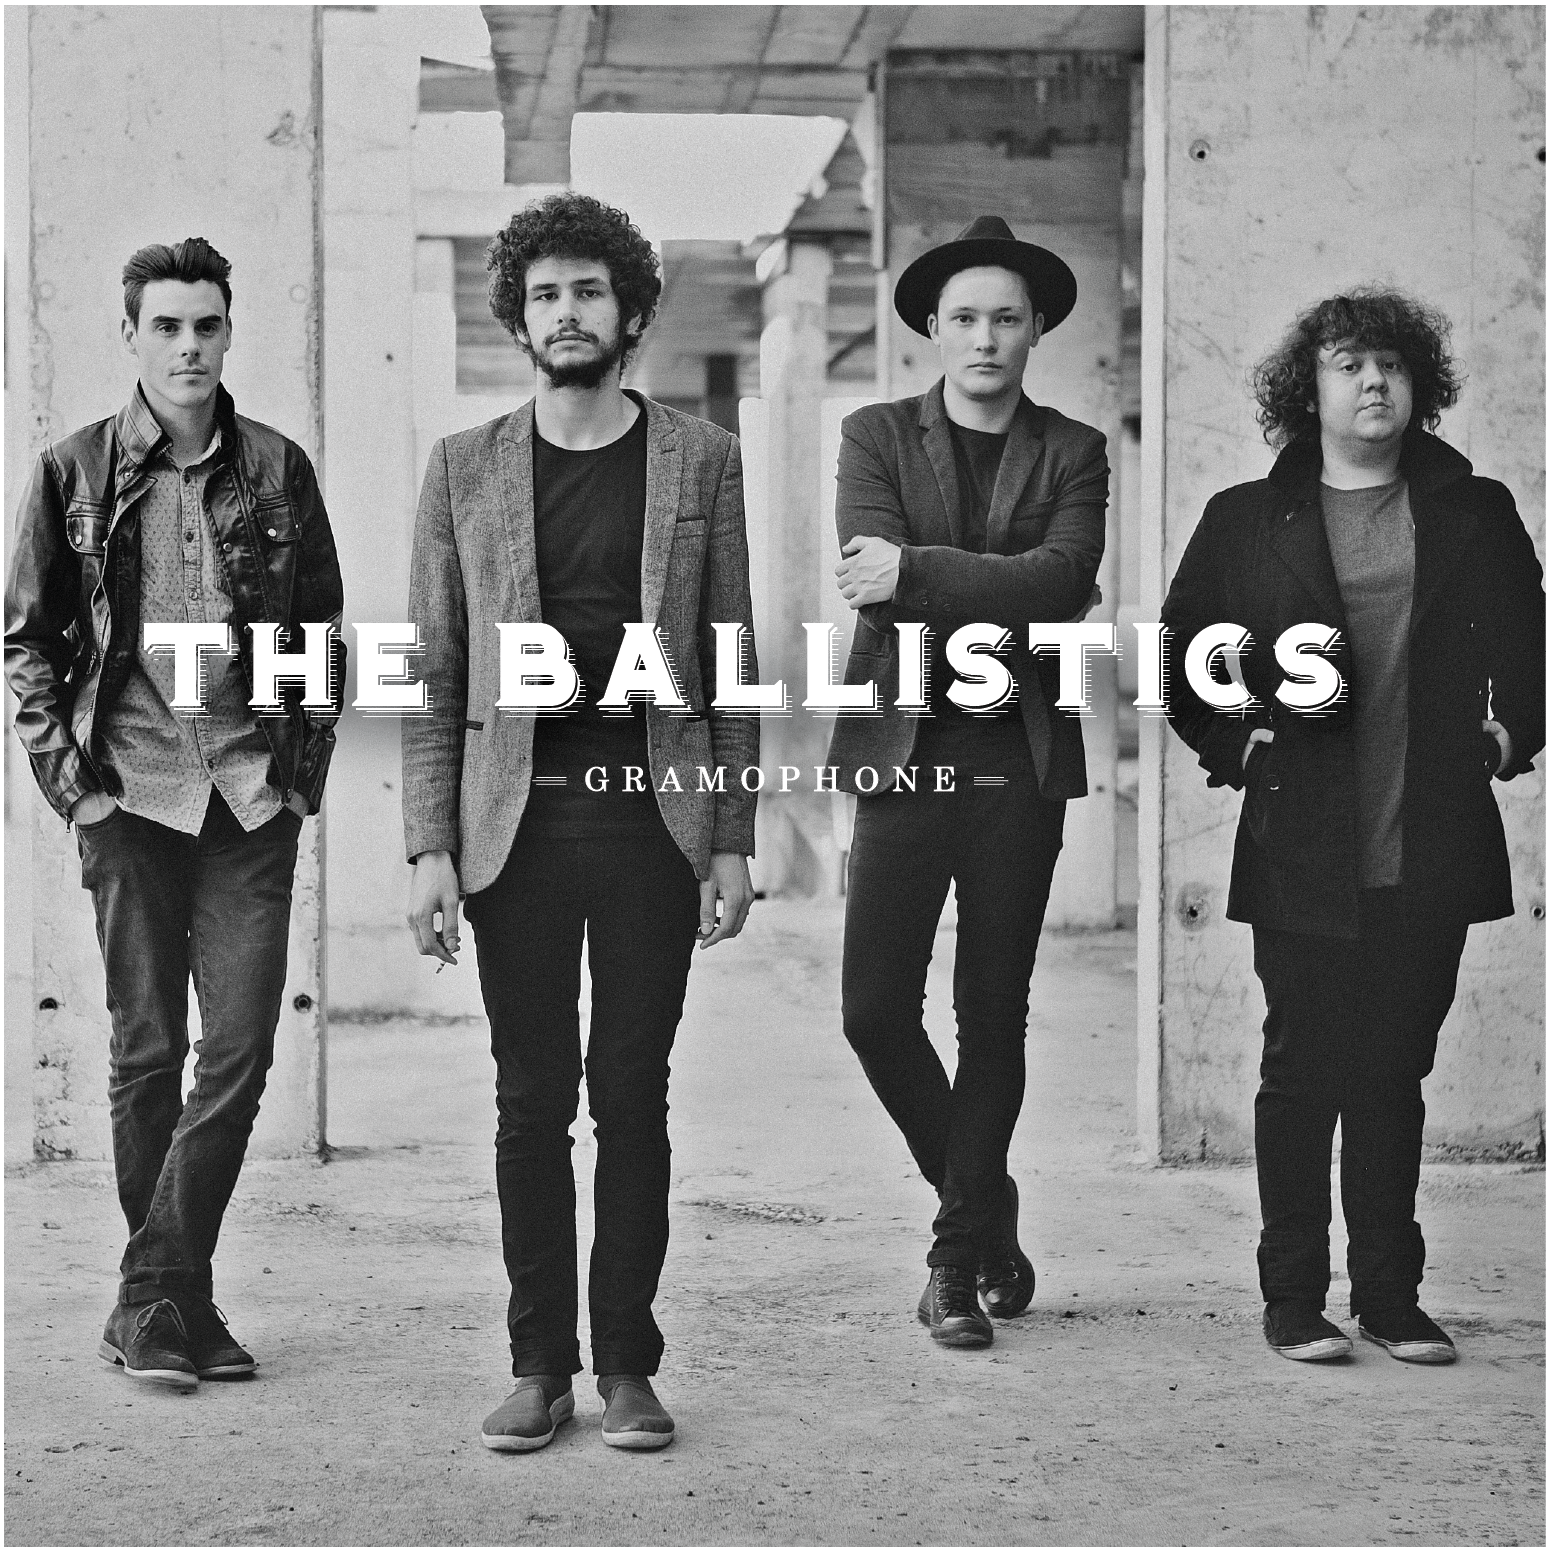 The Ballistics - Gramophone - cover